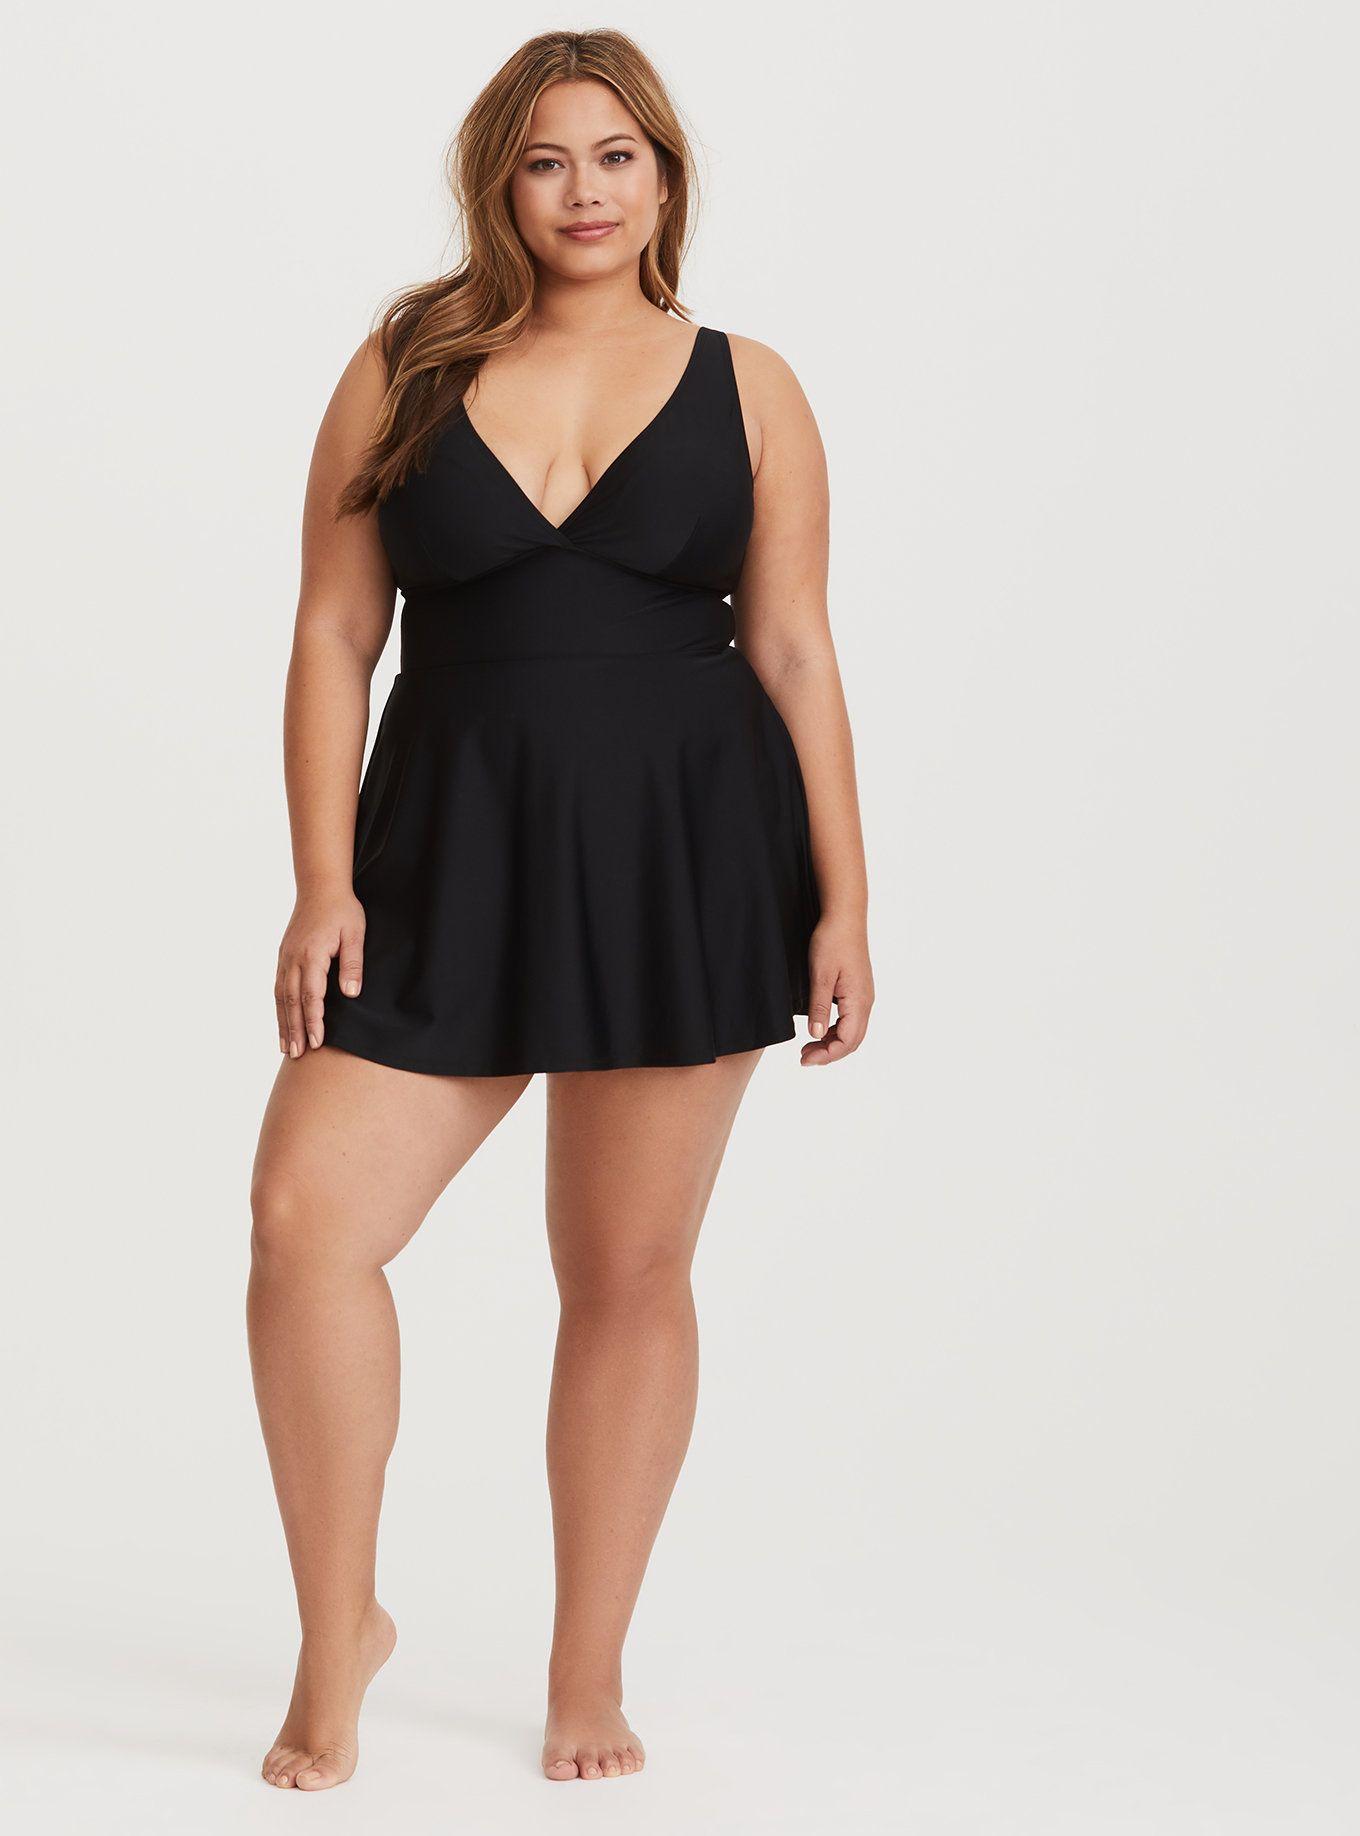 ed591de9d524a Black Deep-V Wireless Skater Dress Swimsuit, DEEP BLACK, alternate